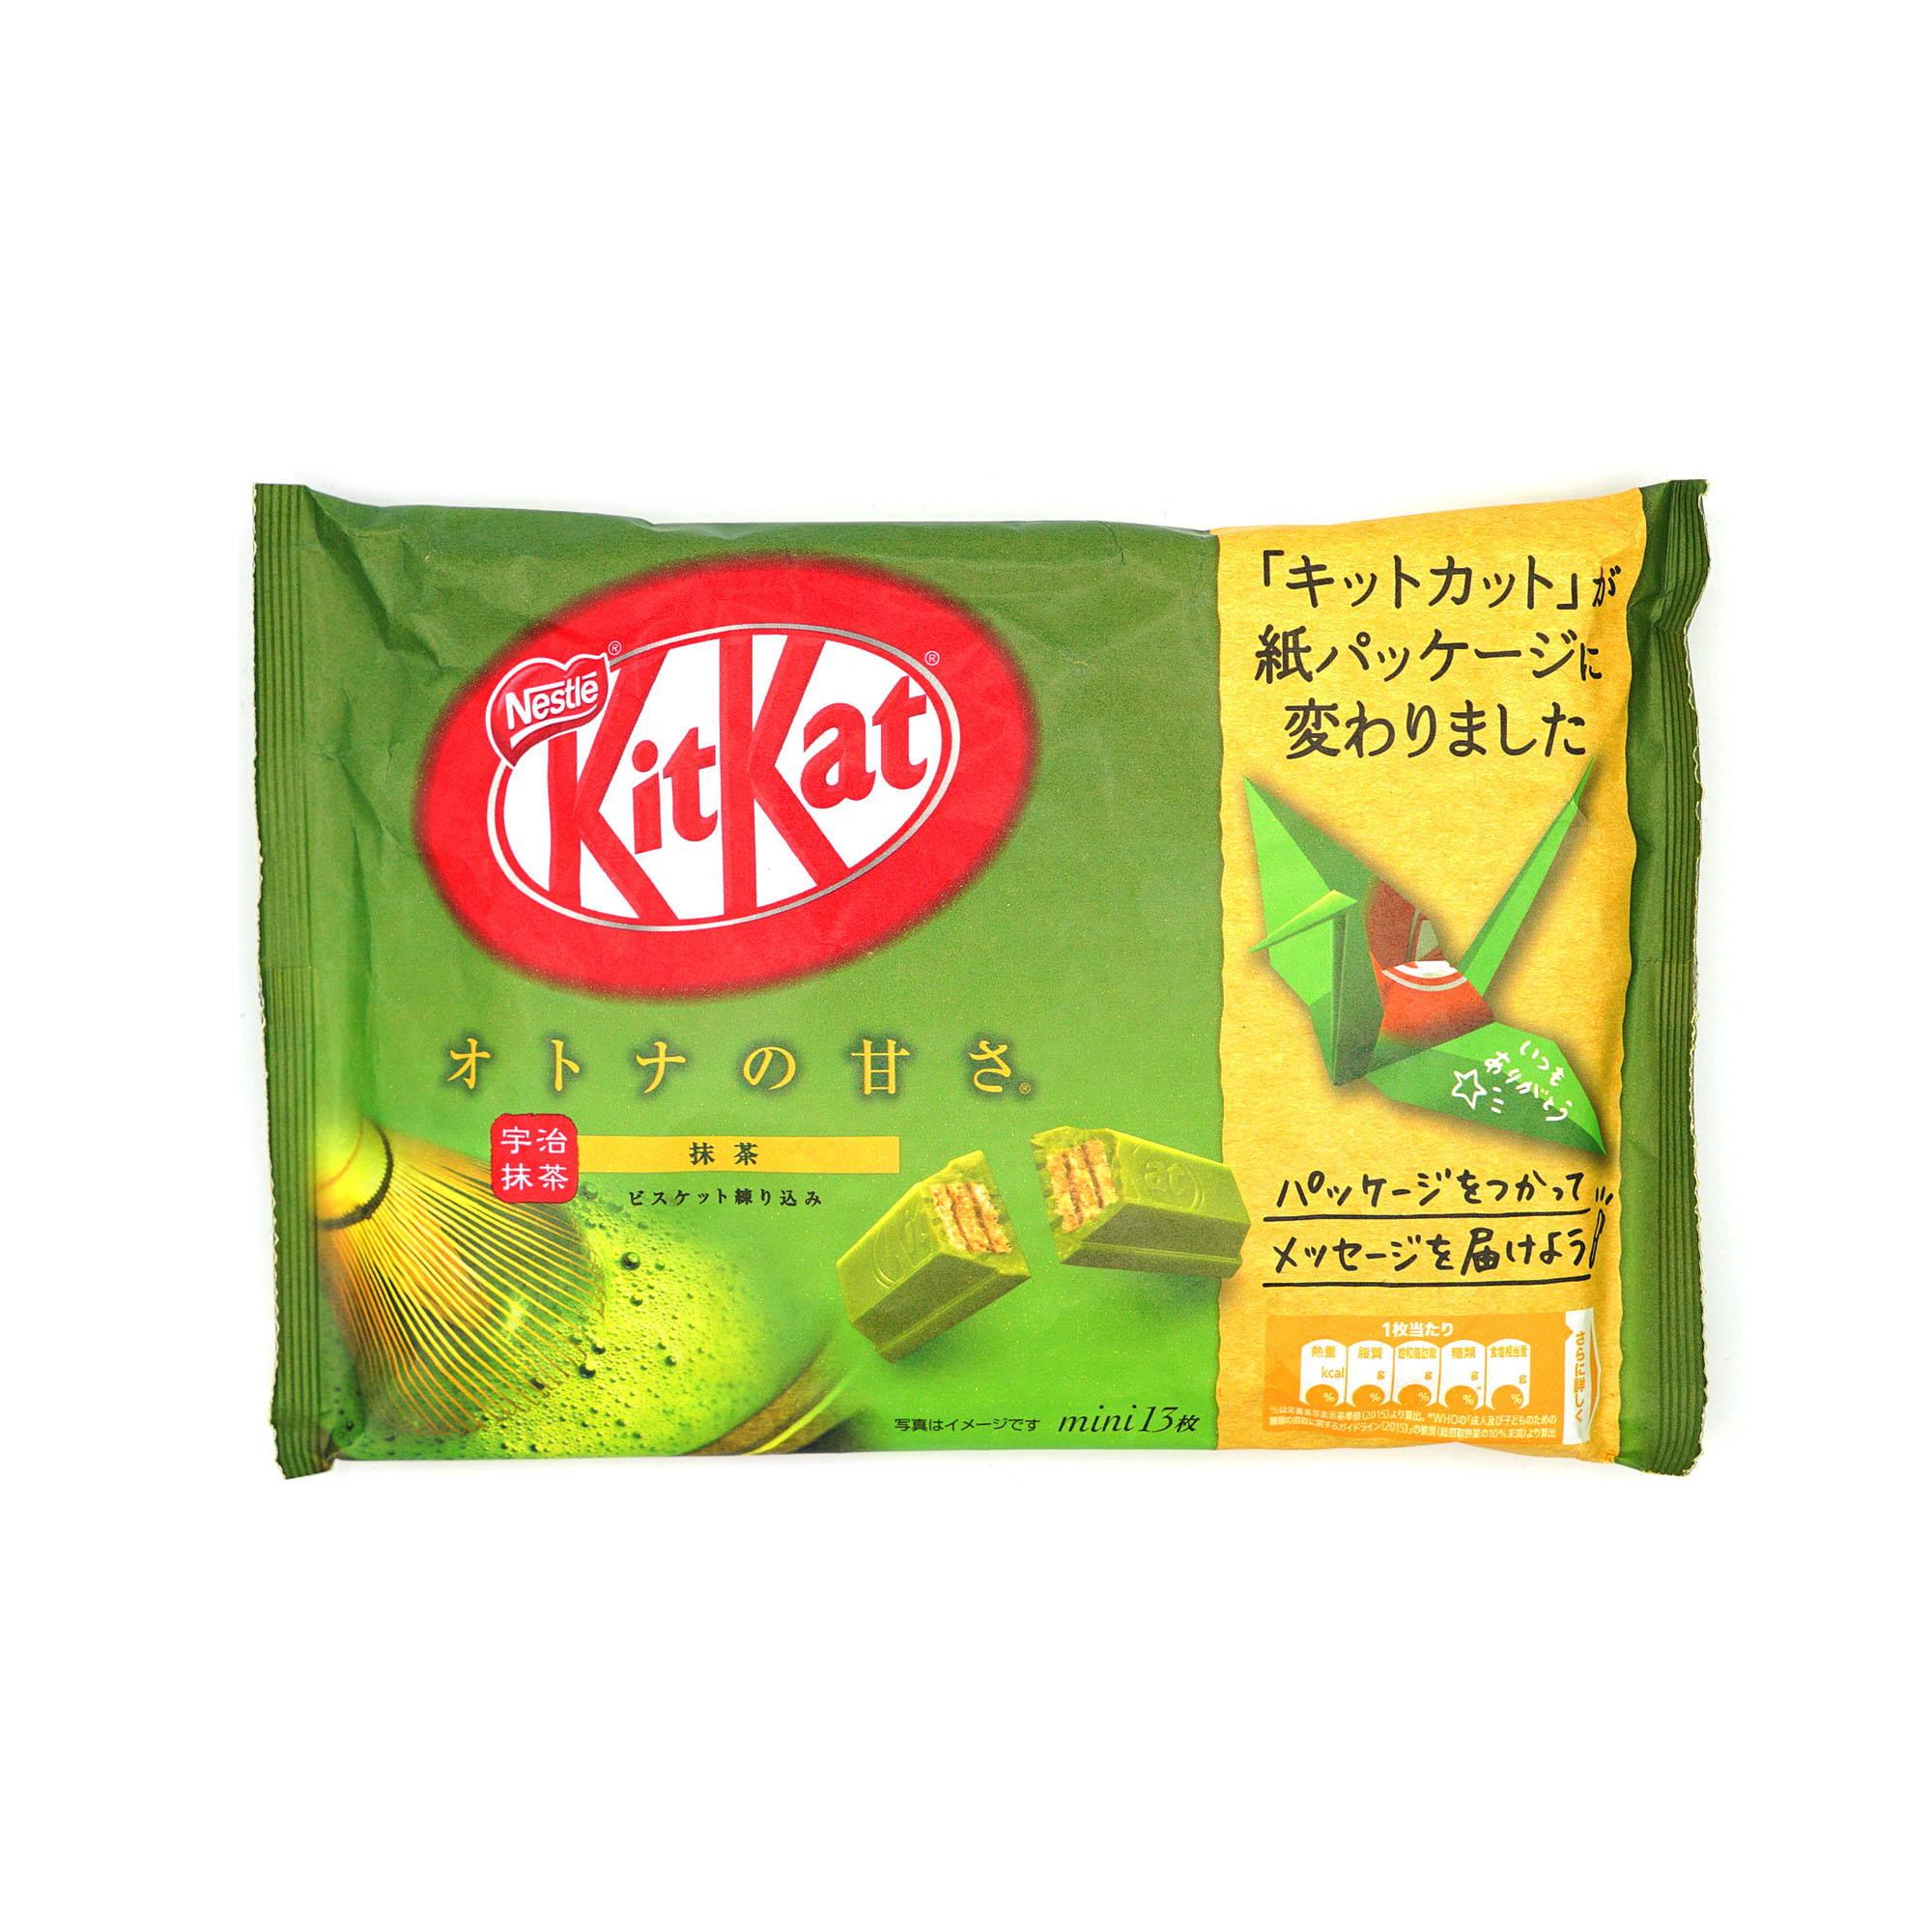 Japanese Kit Kat matcha otona no amasa